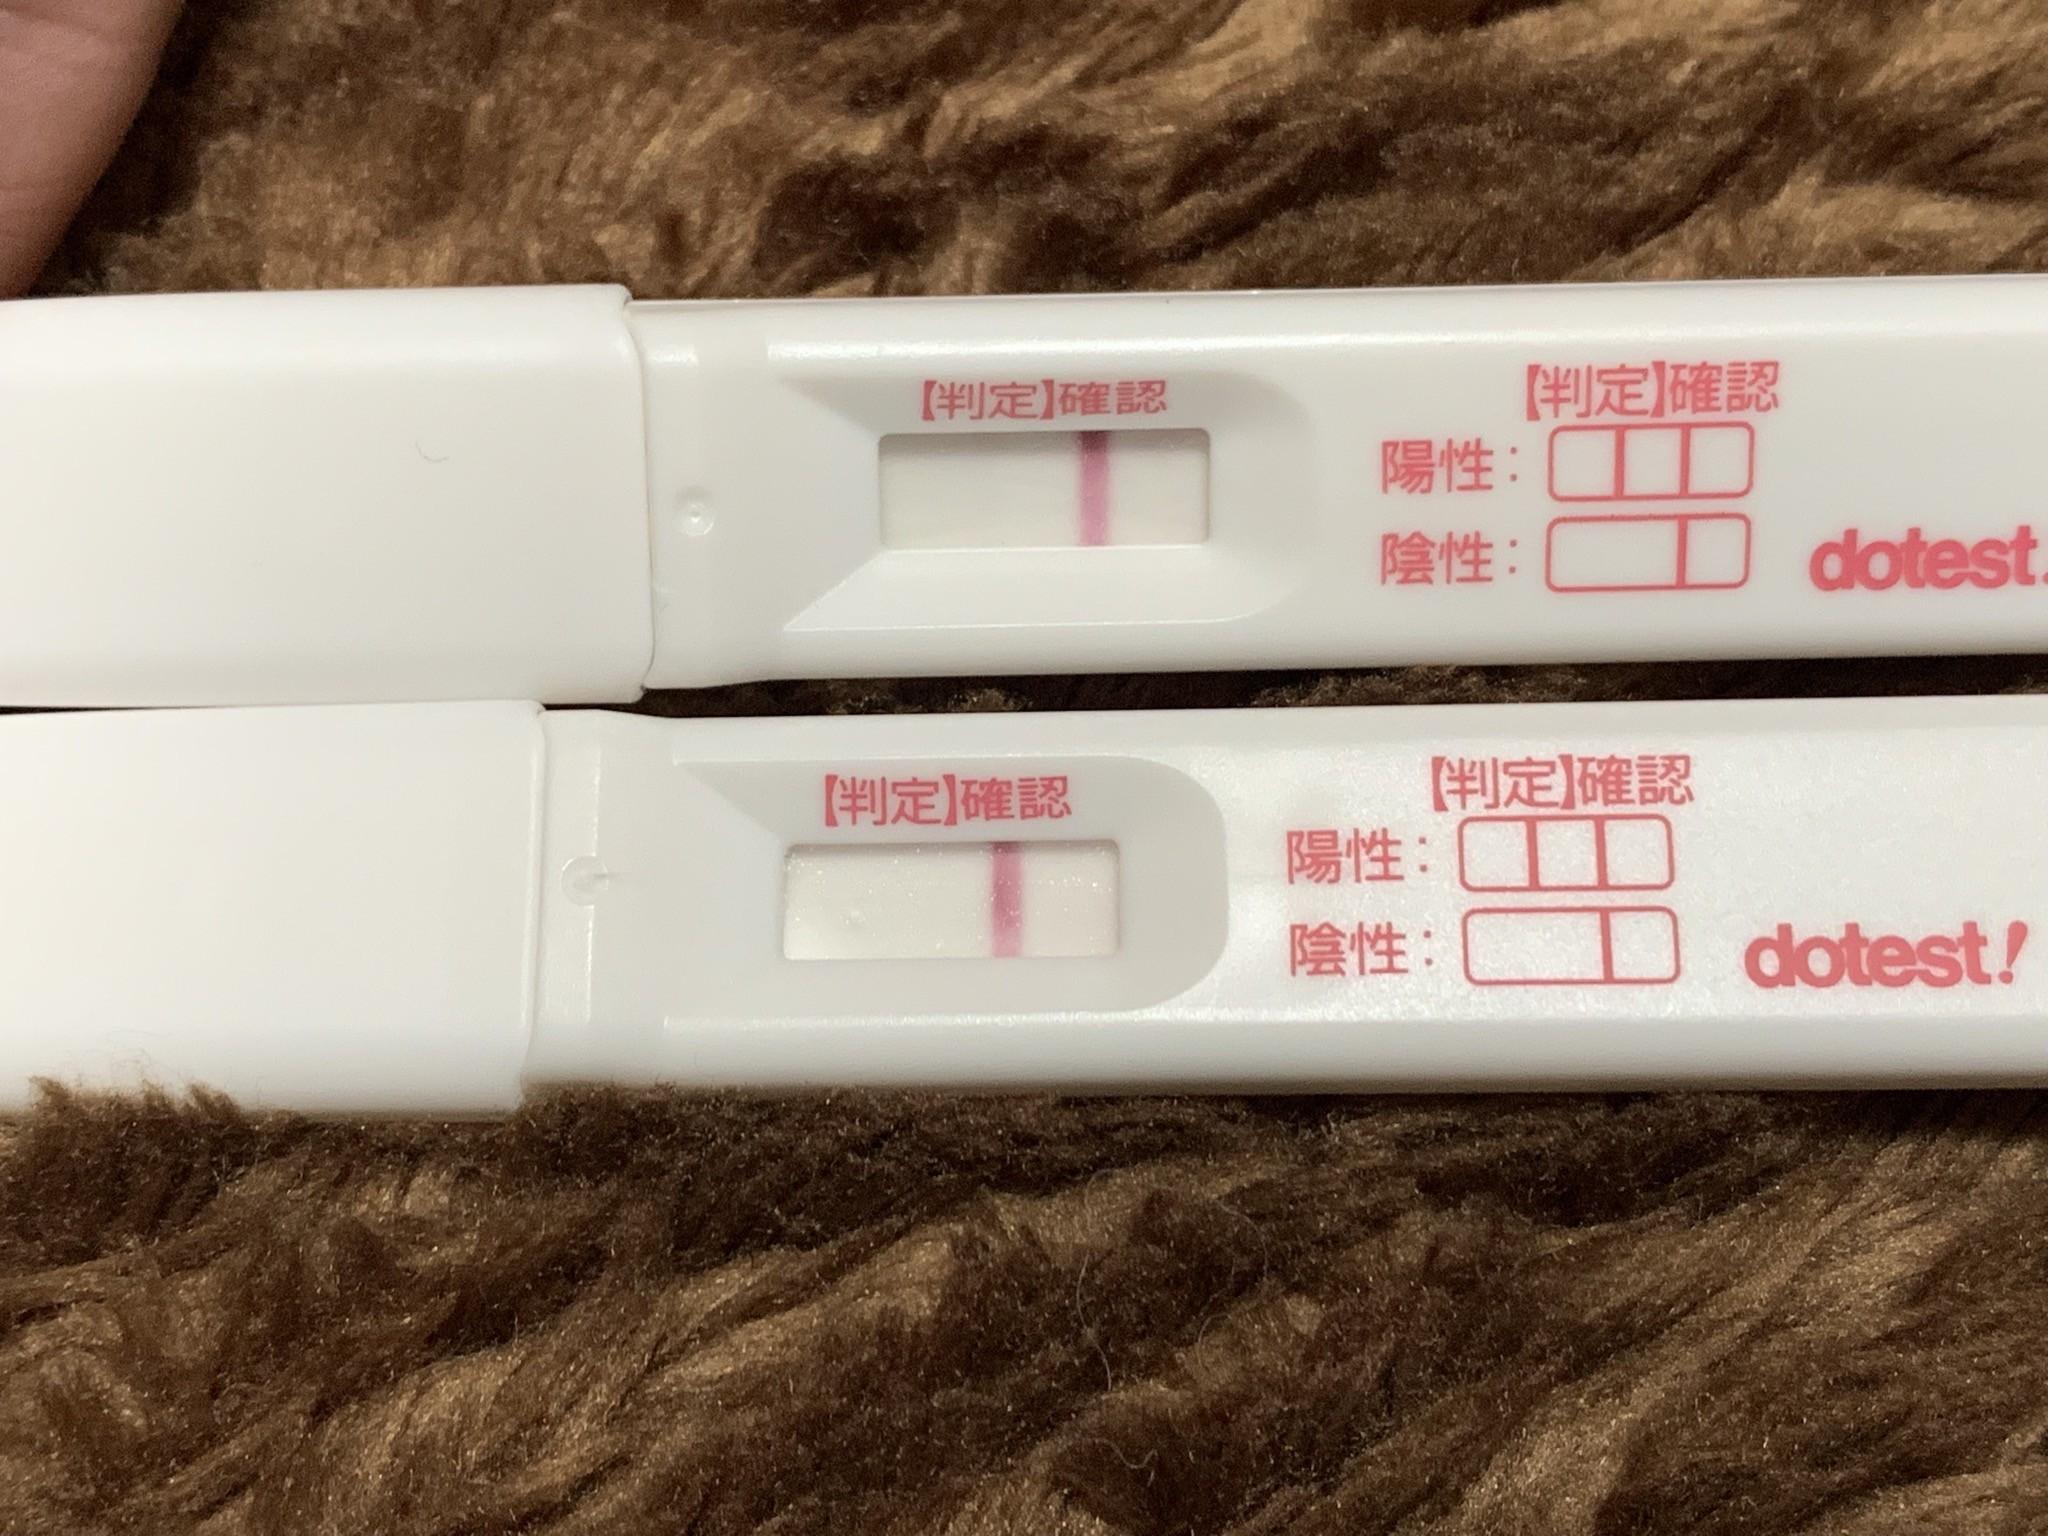 陰性 妊娠の可能性 生理2週間遅れ